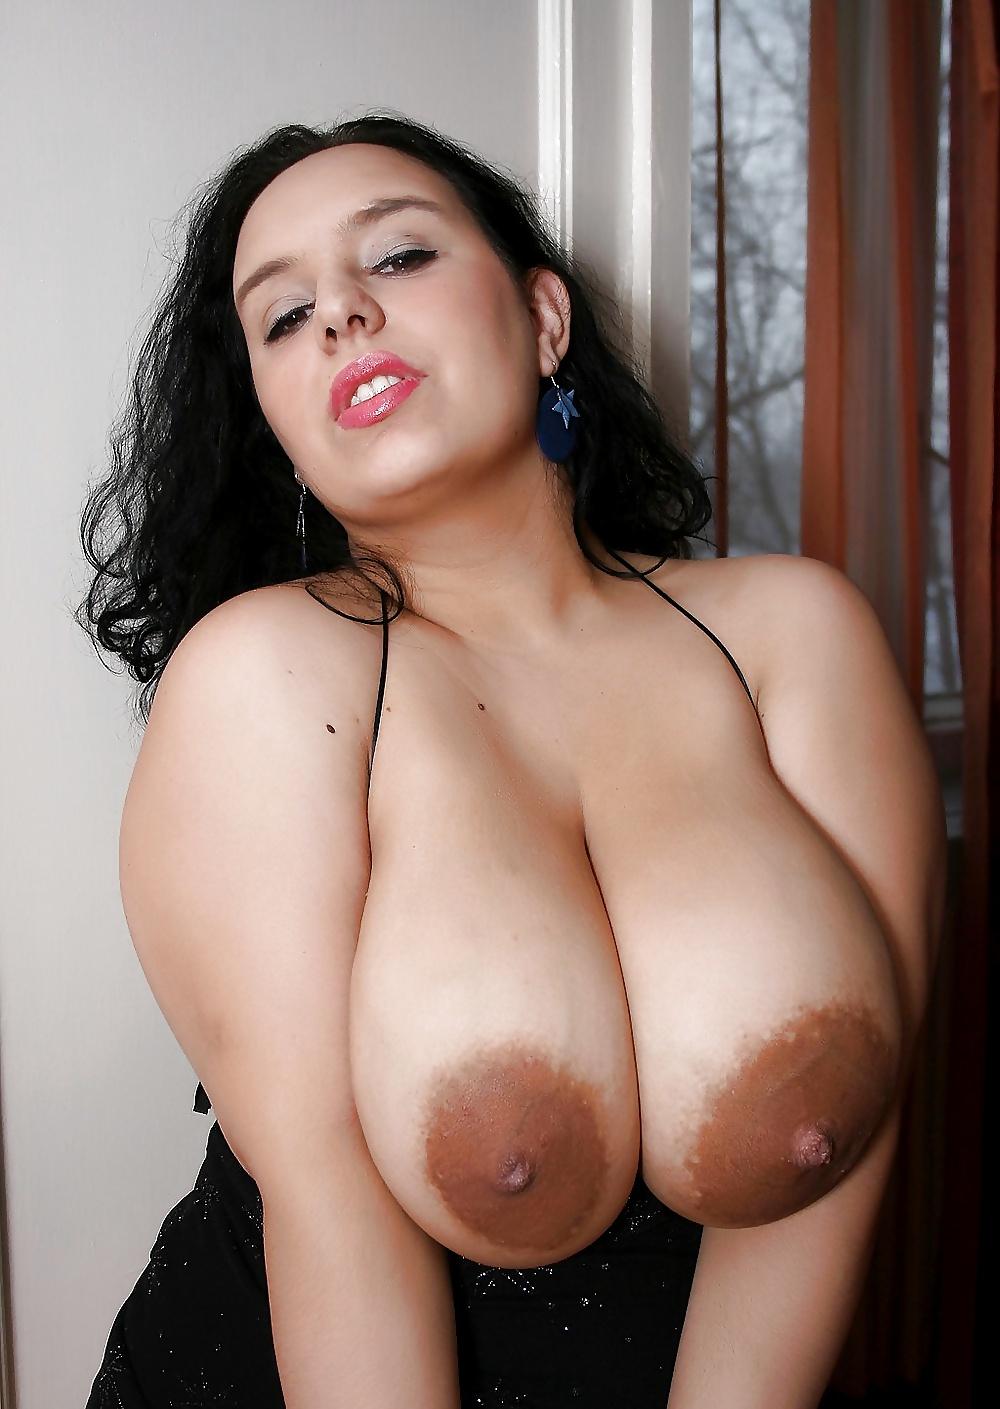 Latina aysha with big natural tits has sex and gets a load of boobs photos